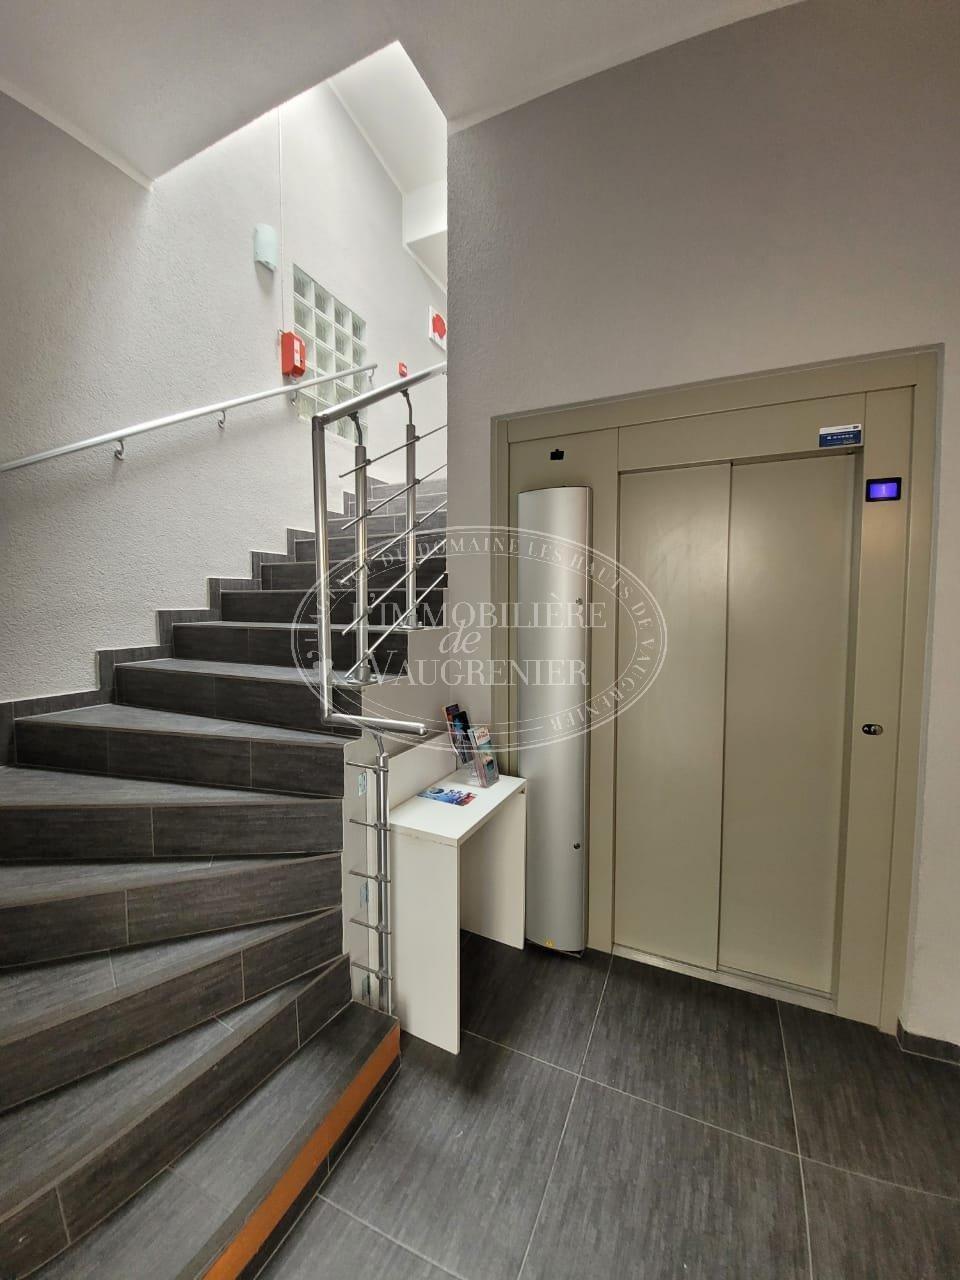 VENTE HOTEL VIEIL ANTIBES 6 CHAMBRES 950 000.-€